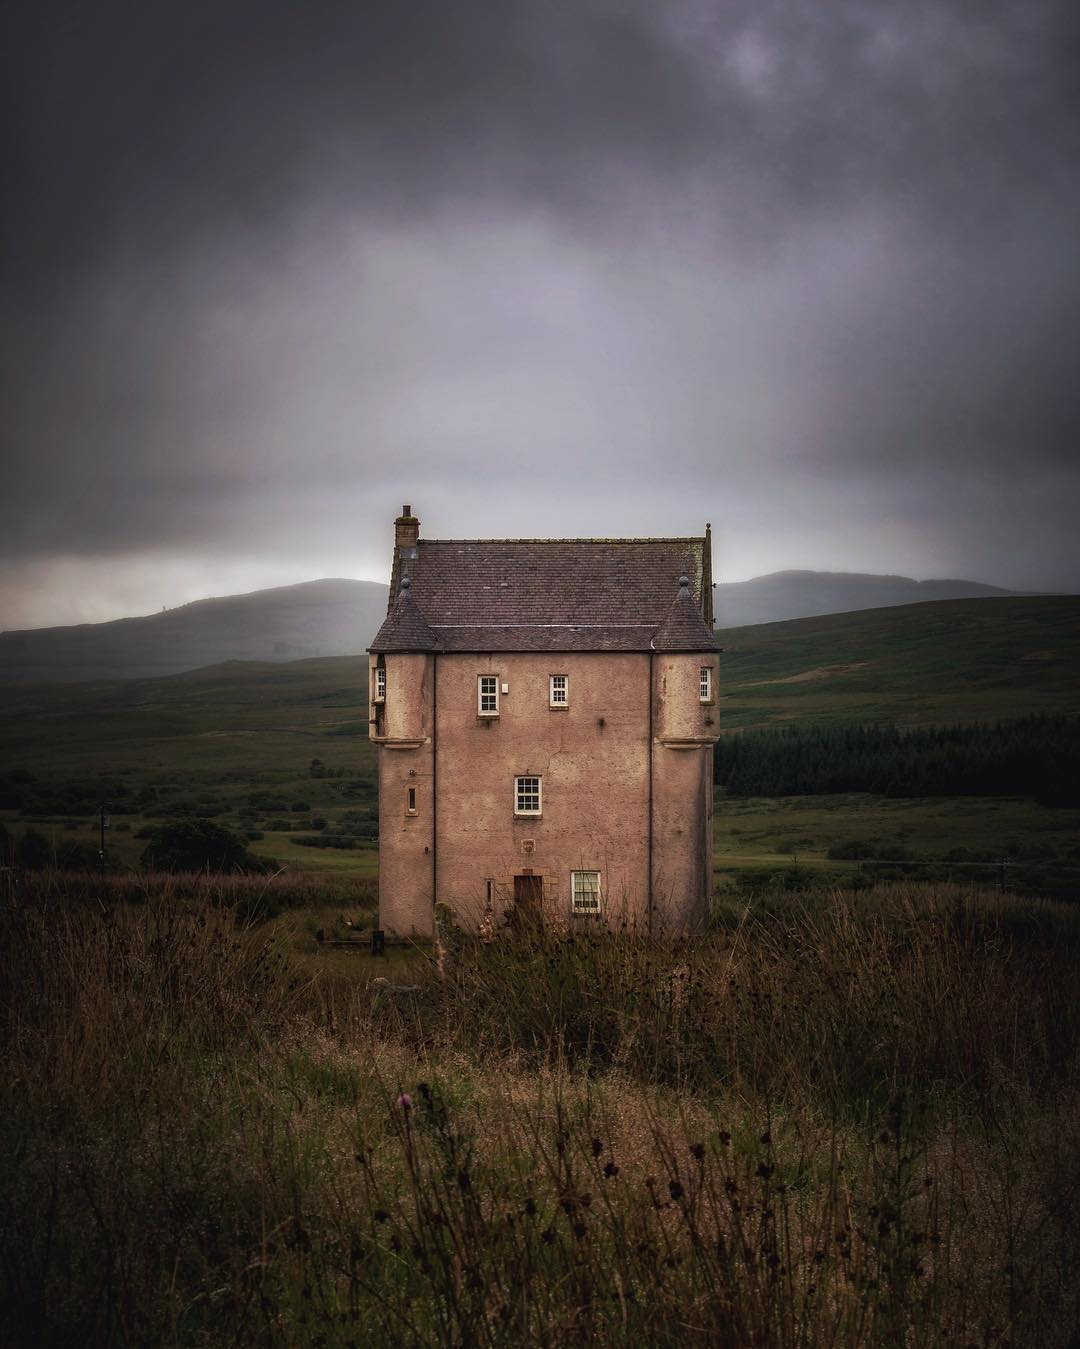 Brockloch Tower by @mintygremlin